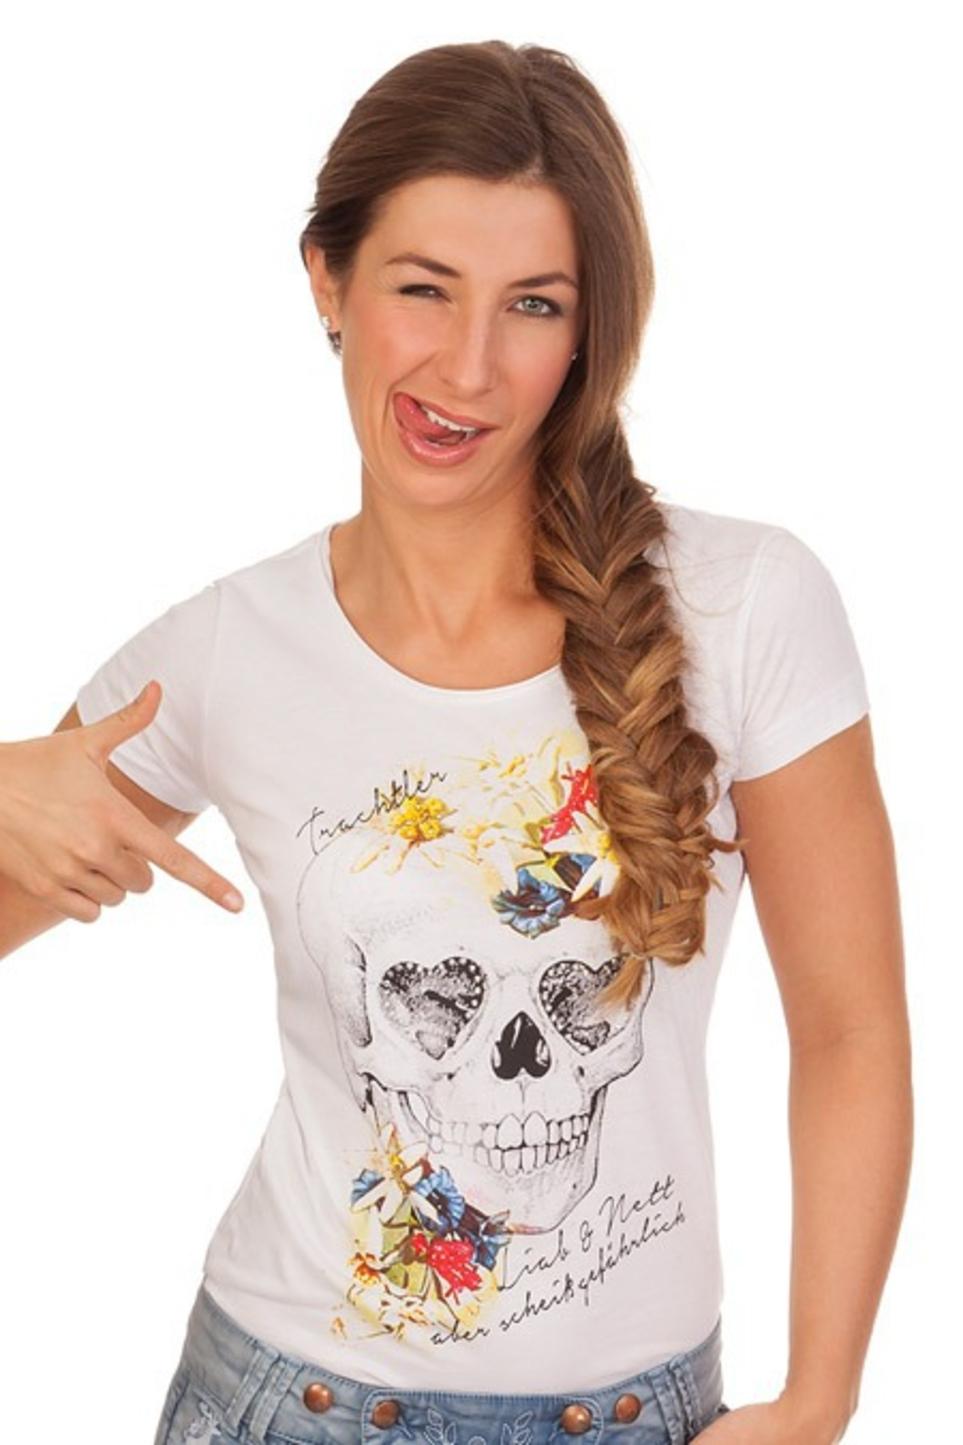 31116d8517d1ef Hangowear Trachten Shirt - MERLE - weiß online kaufen